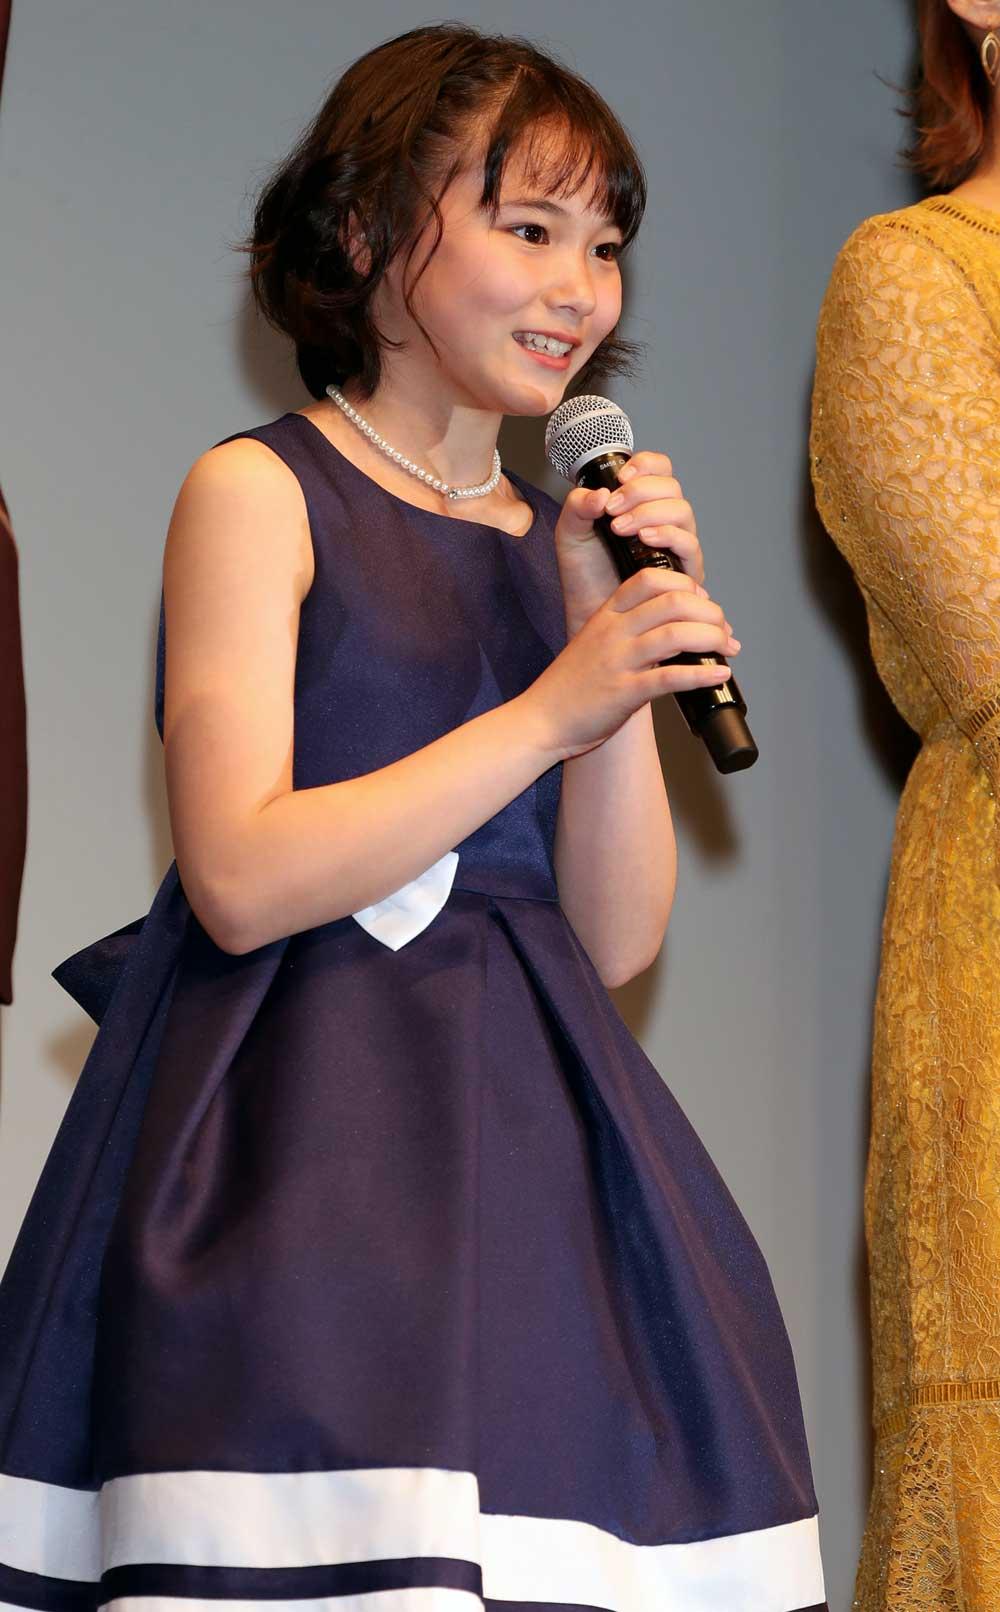 Images : 4番目の画像 - 「池田エライザ/5月24日公開の映画『貞子』の完成披露試写イベントに登場。「ただ怖い映画というわけでなくて、一味違う幽霊模様というか、人間模様が描かれています」」のアルバム - Stereo Sound ONLINE